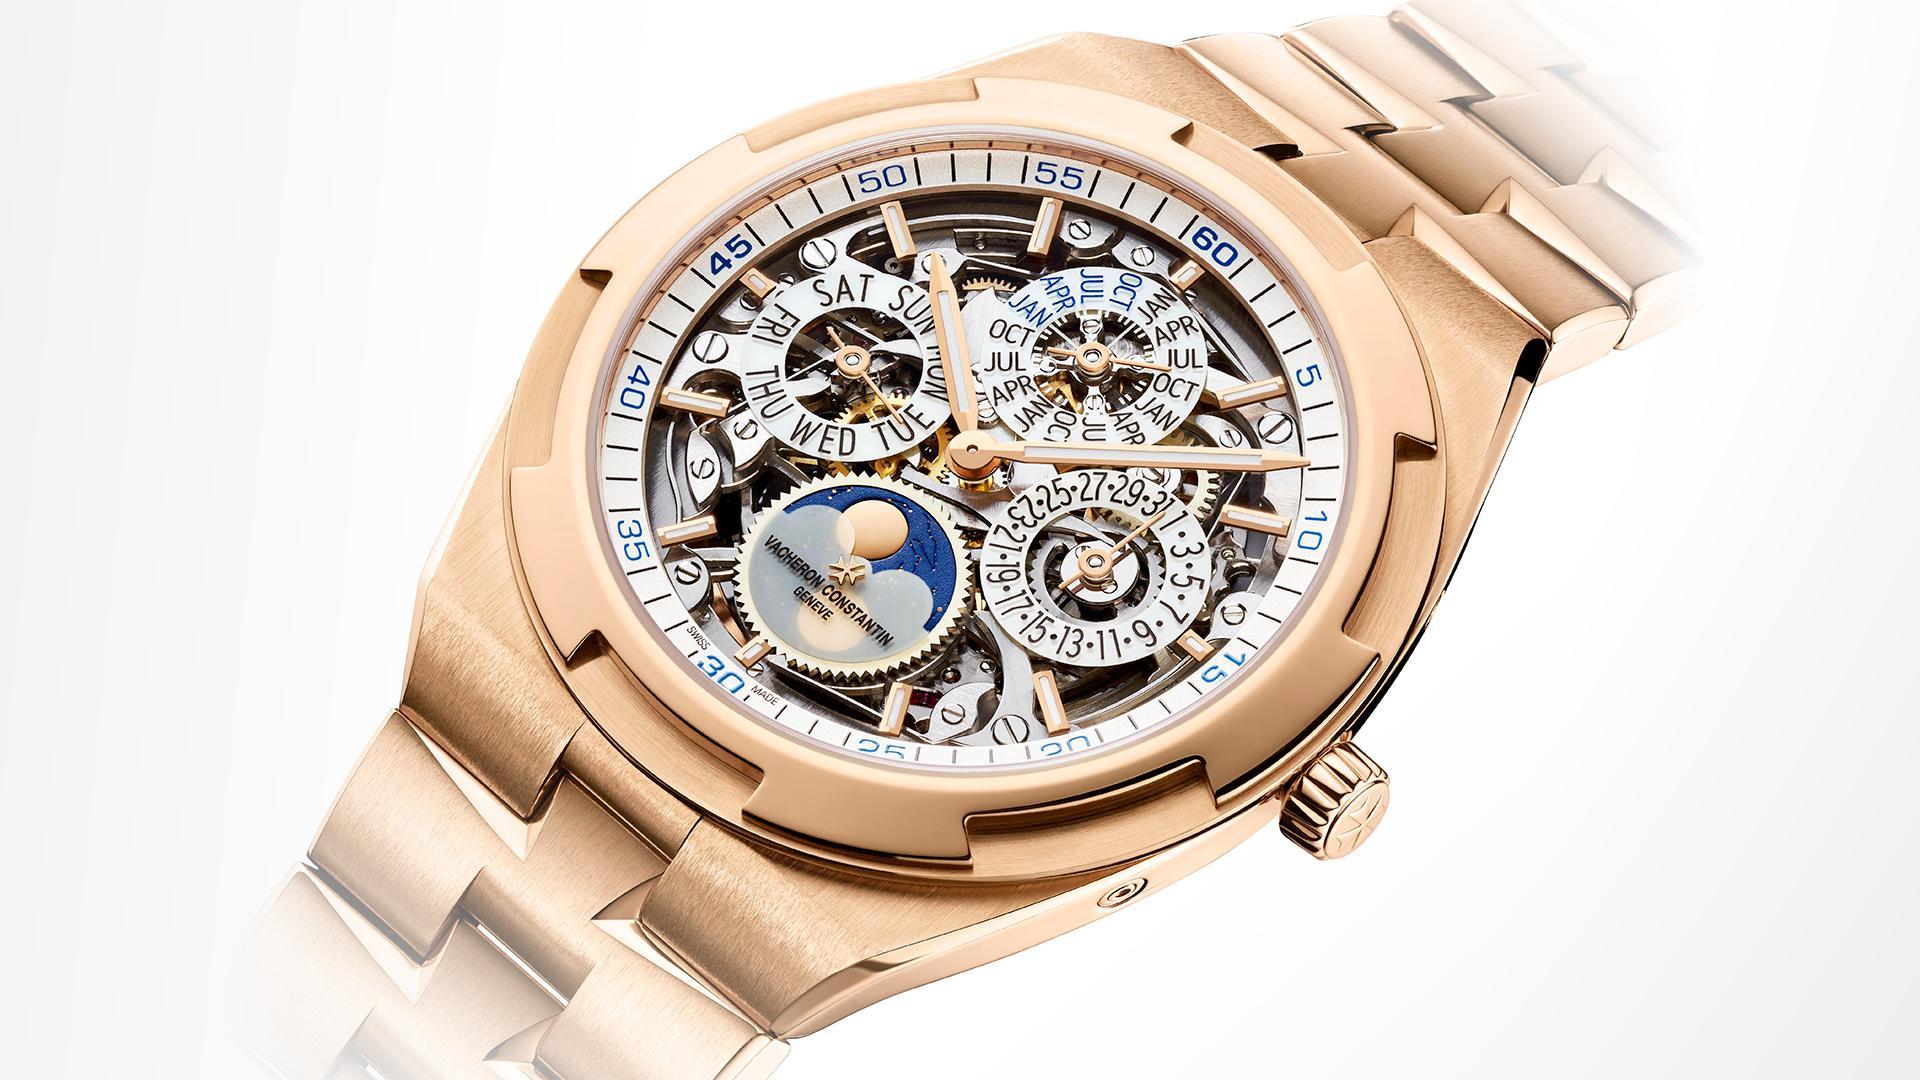 Vacheron Constantin Overseas Perpetual Calendar Ultra-Thin Skeleton sports watch